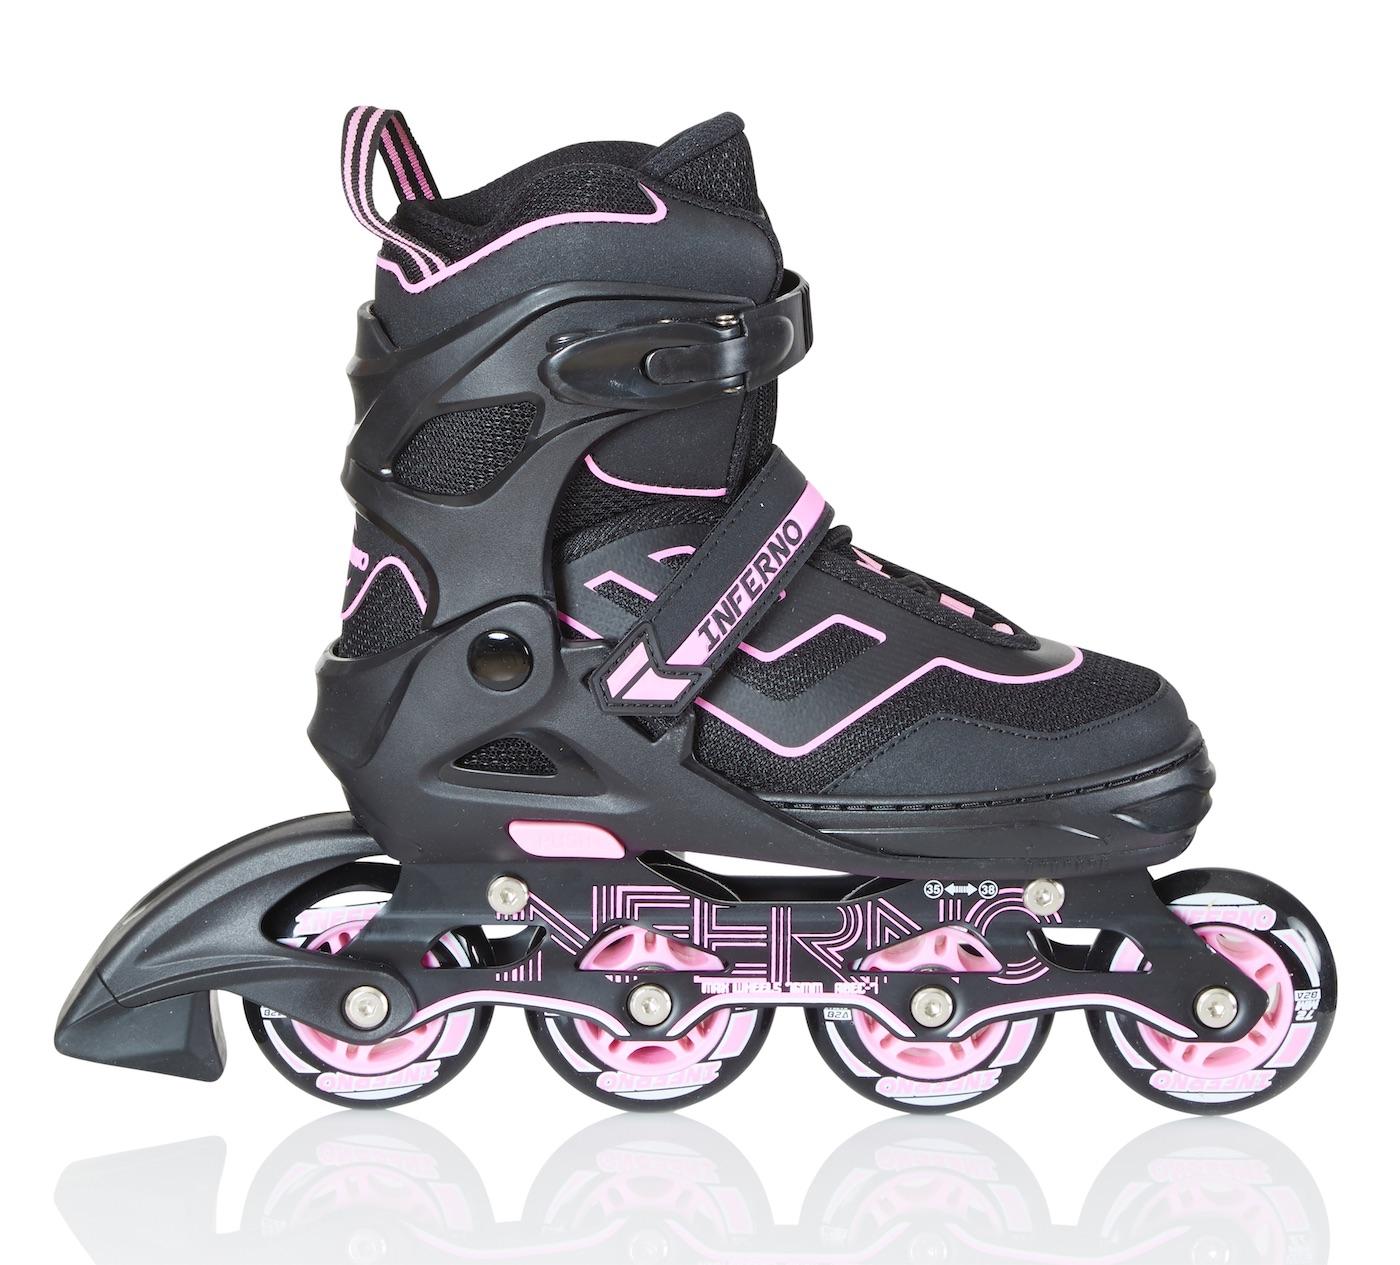 Inferno - Inliner Rollerblade - Pink (39-42)